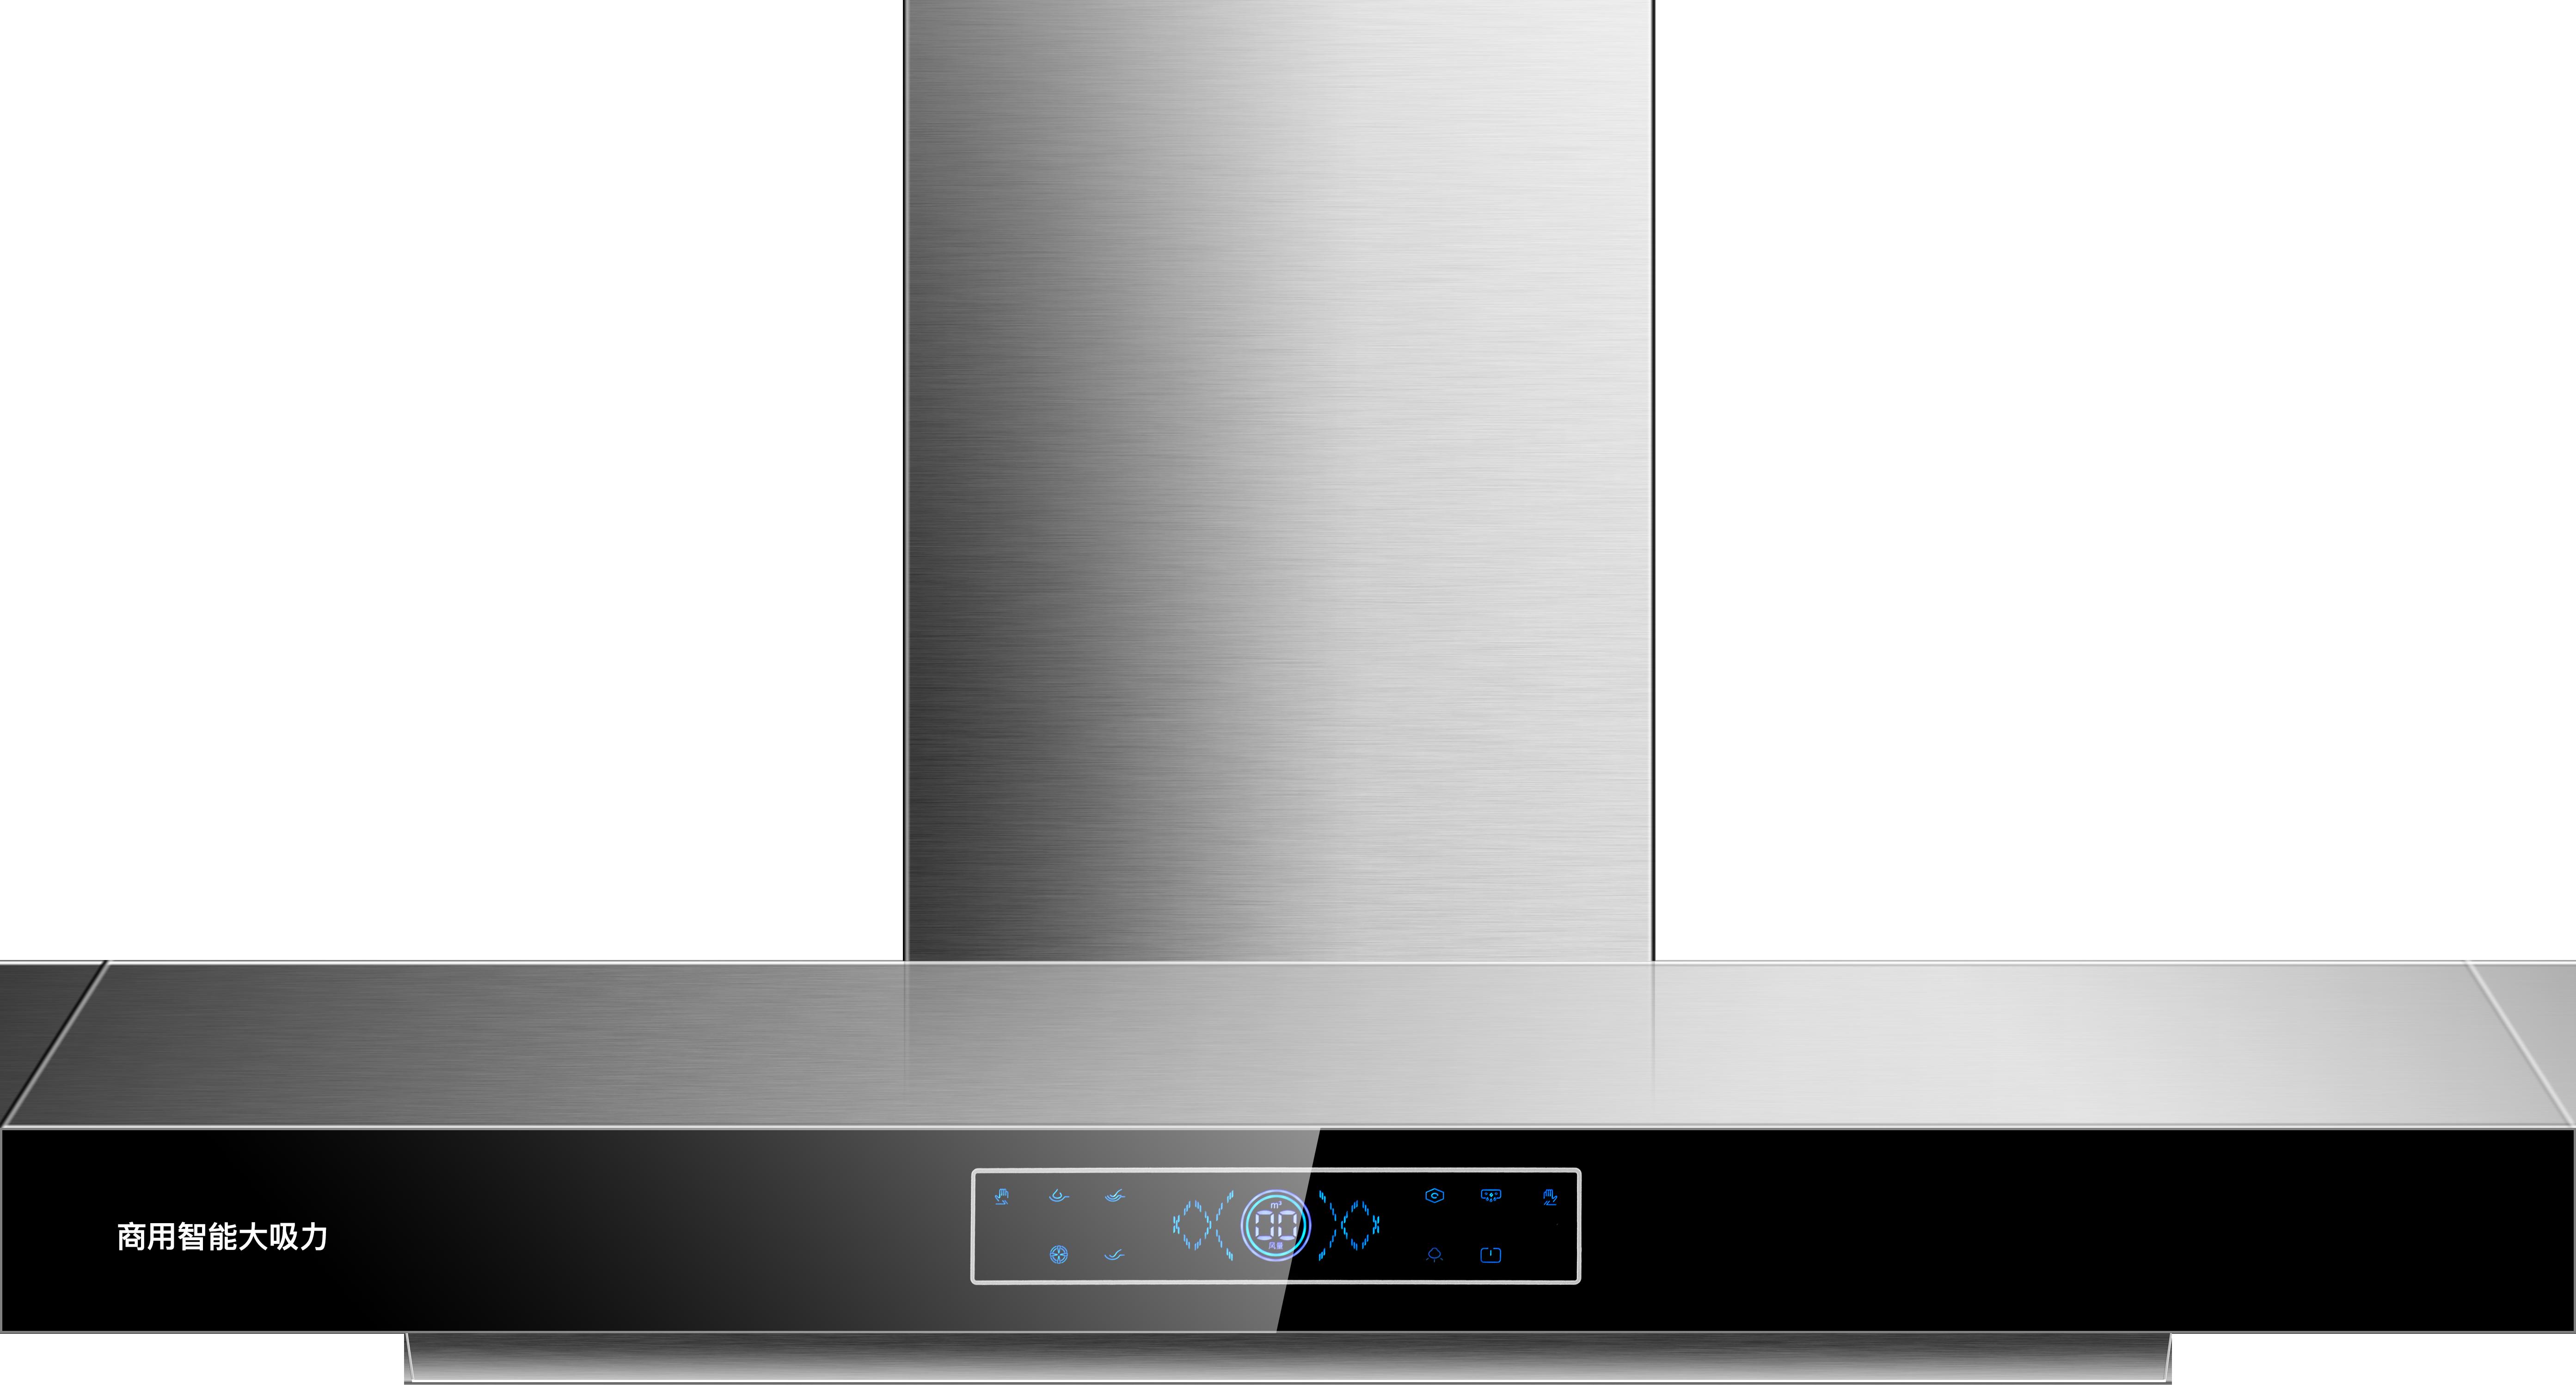 Hotel Equipment Commercial Cooking Appliances Kitchen range hood